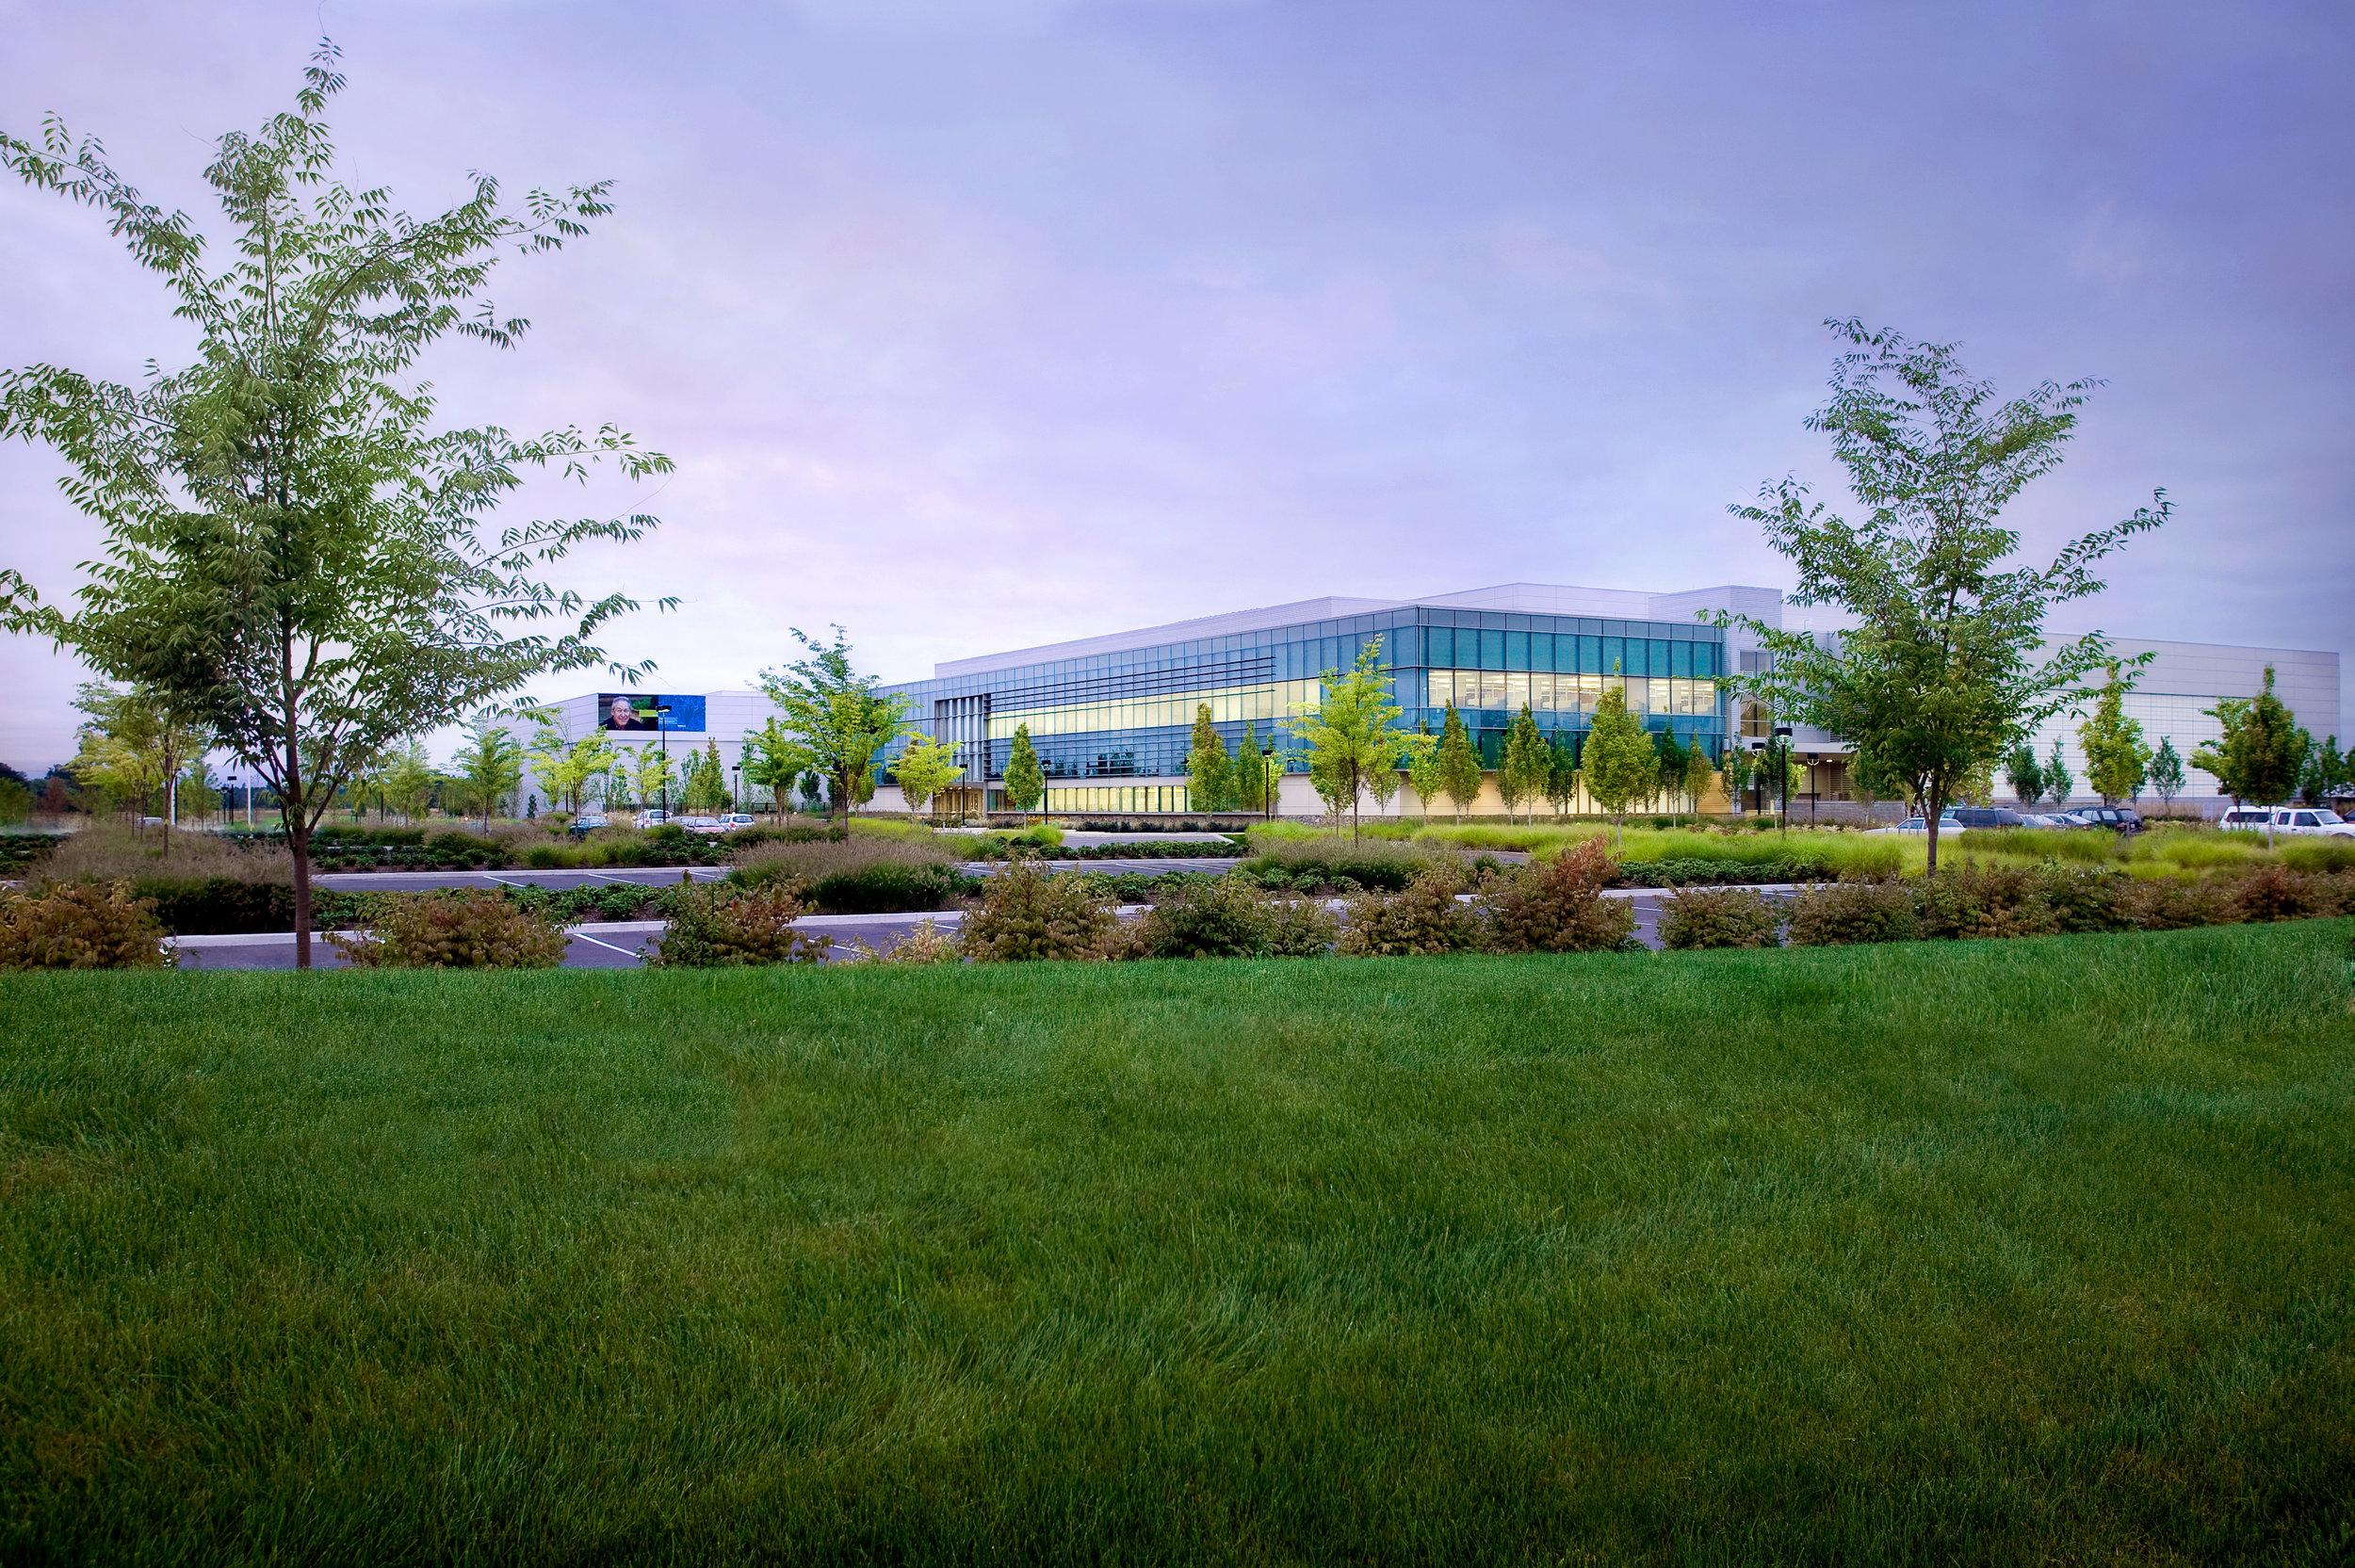 Corporate office building and landscape in North Hillsboro